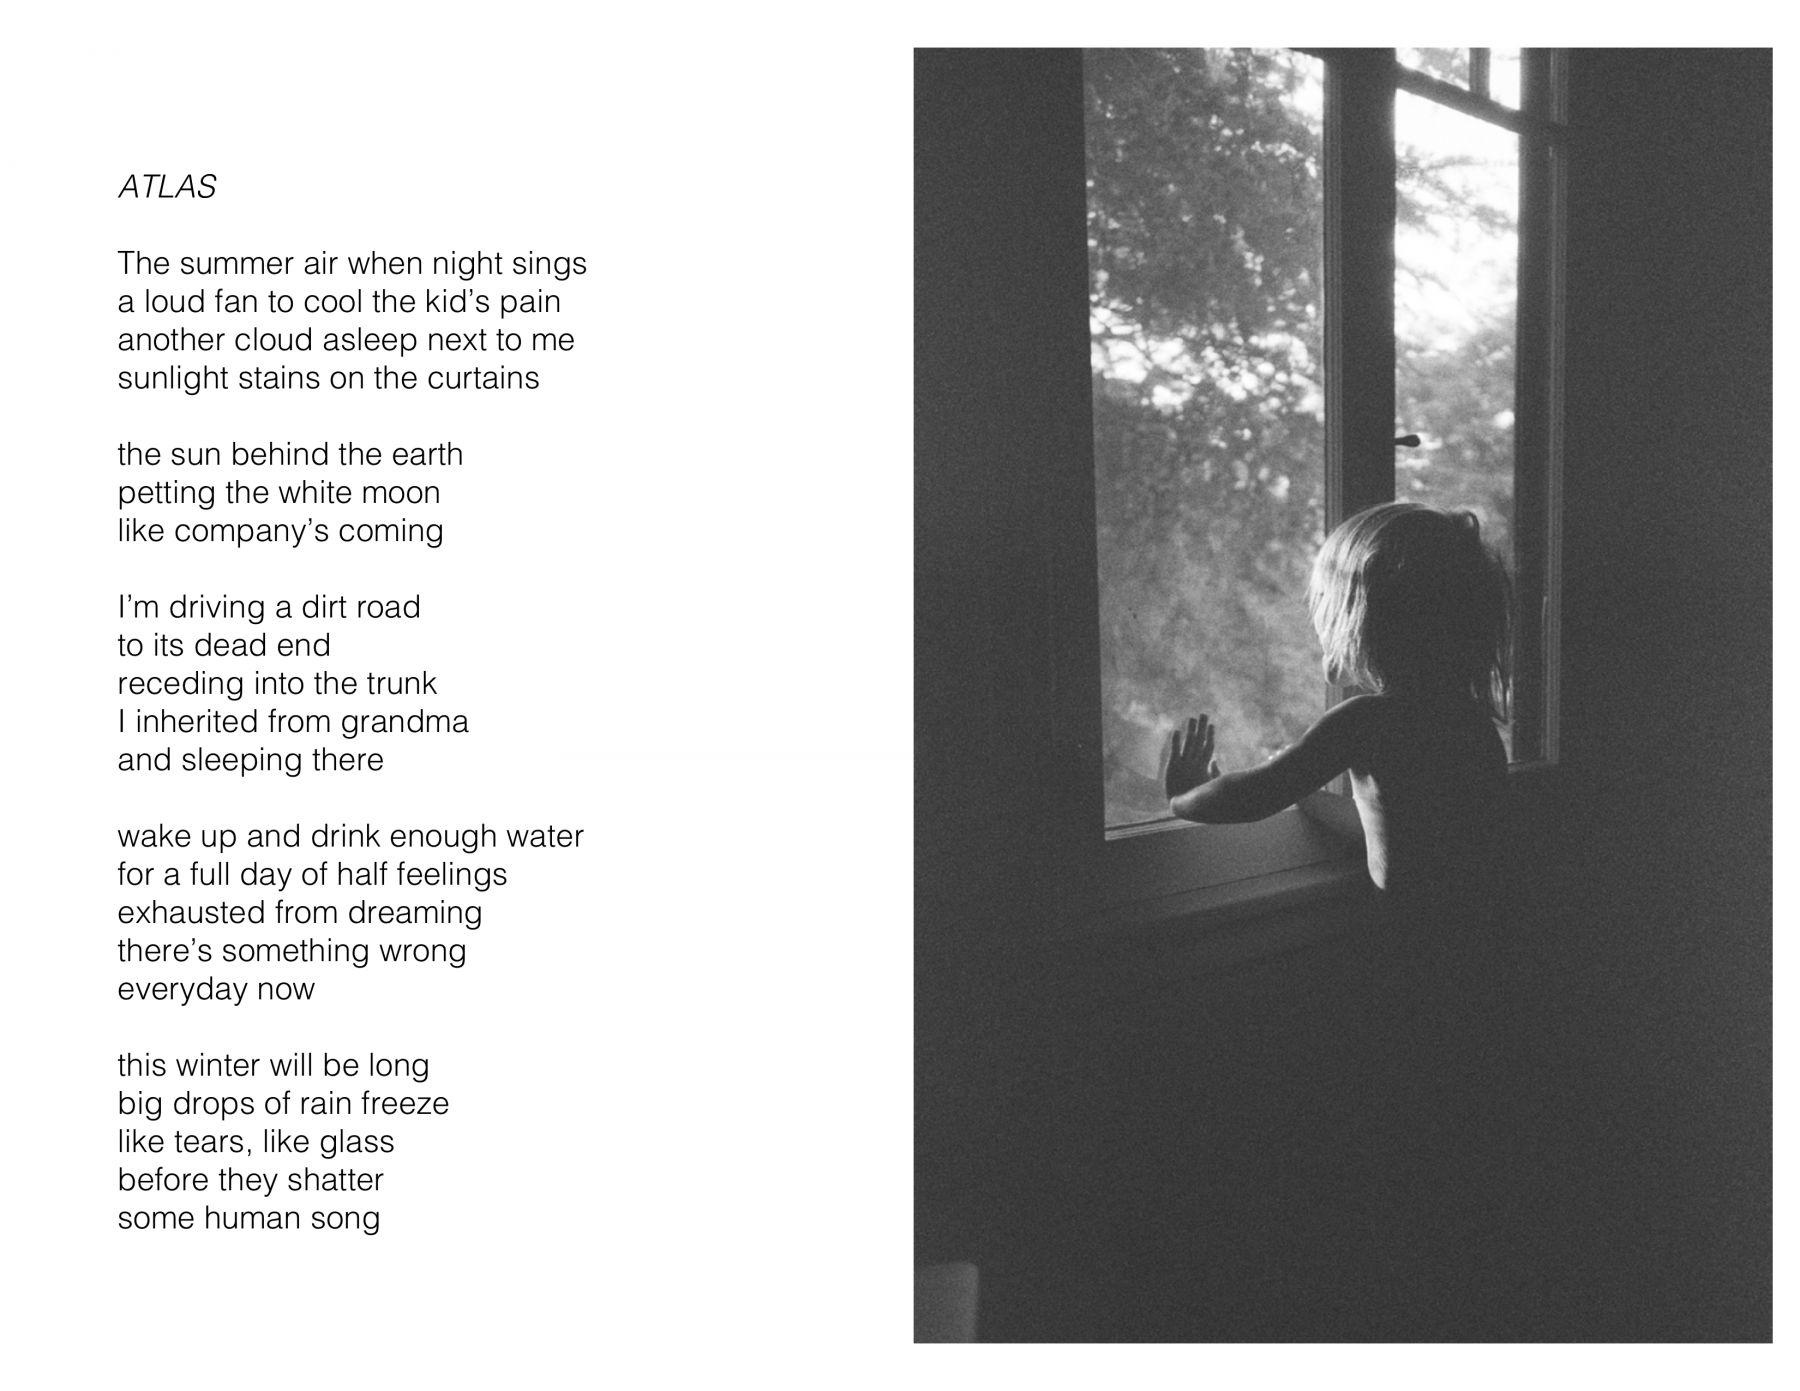 poem + image